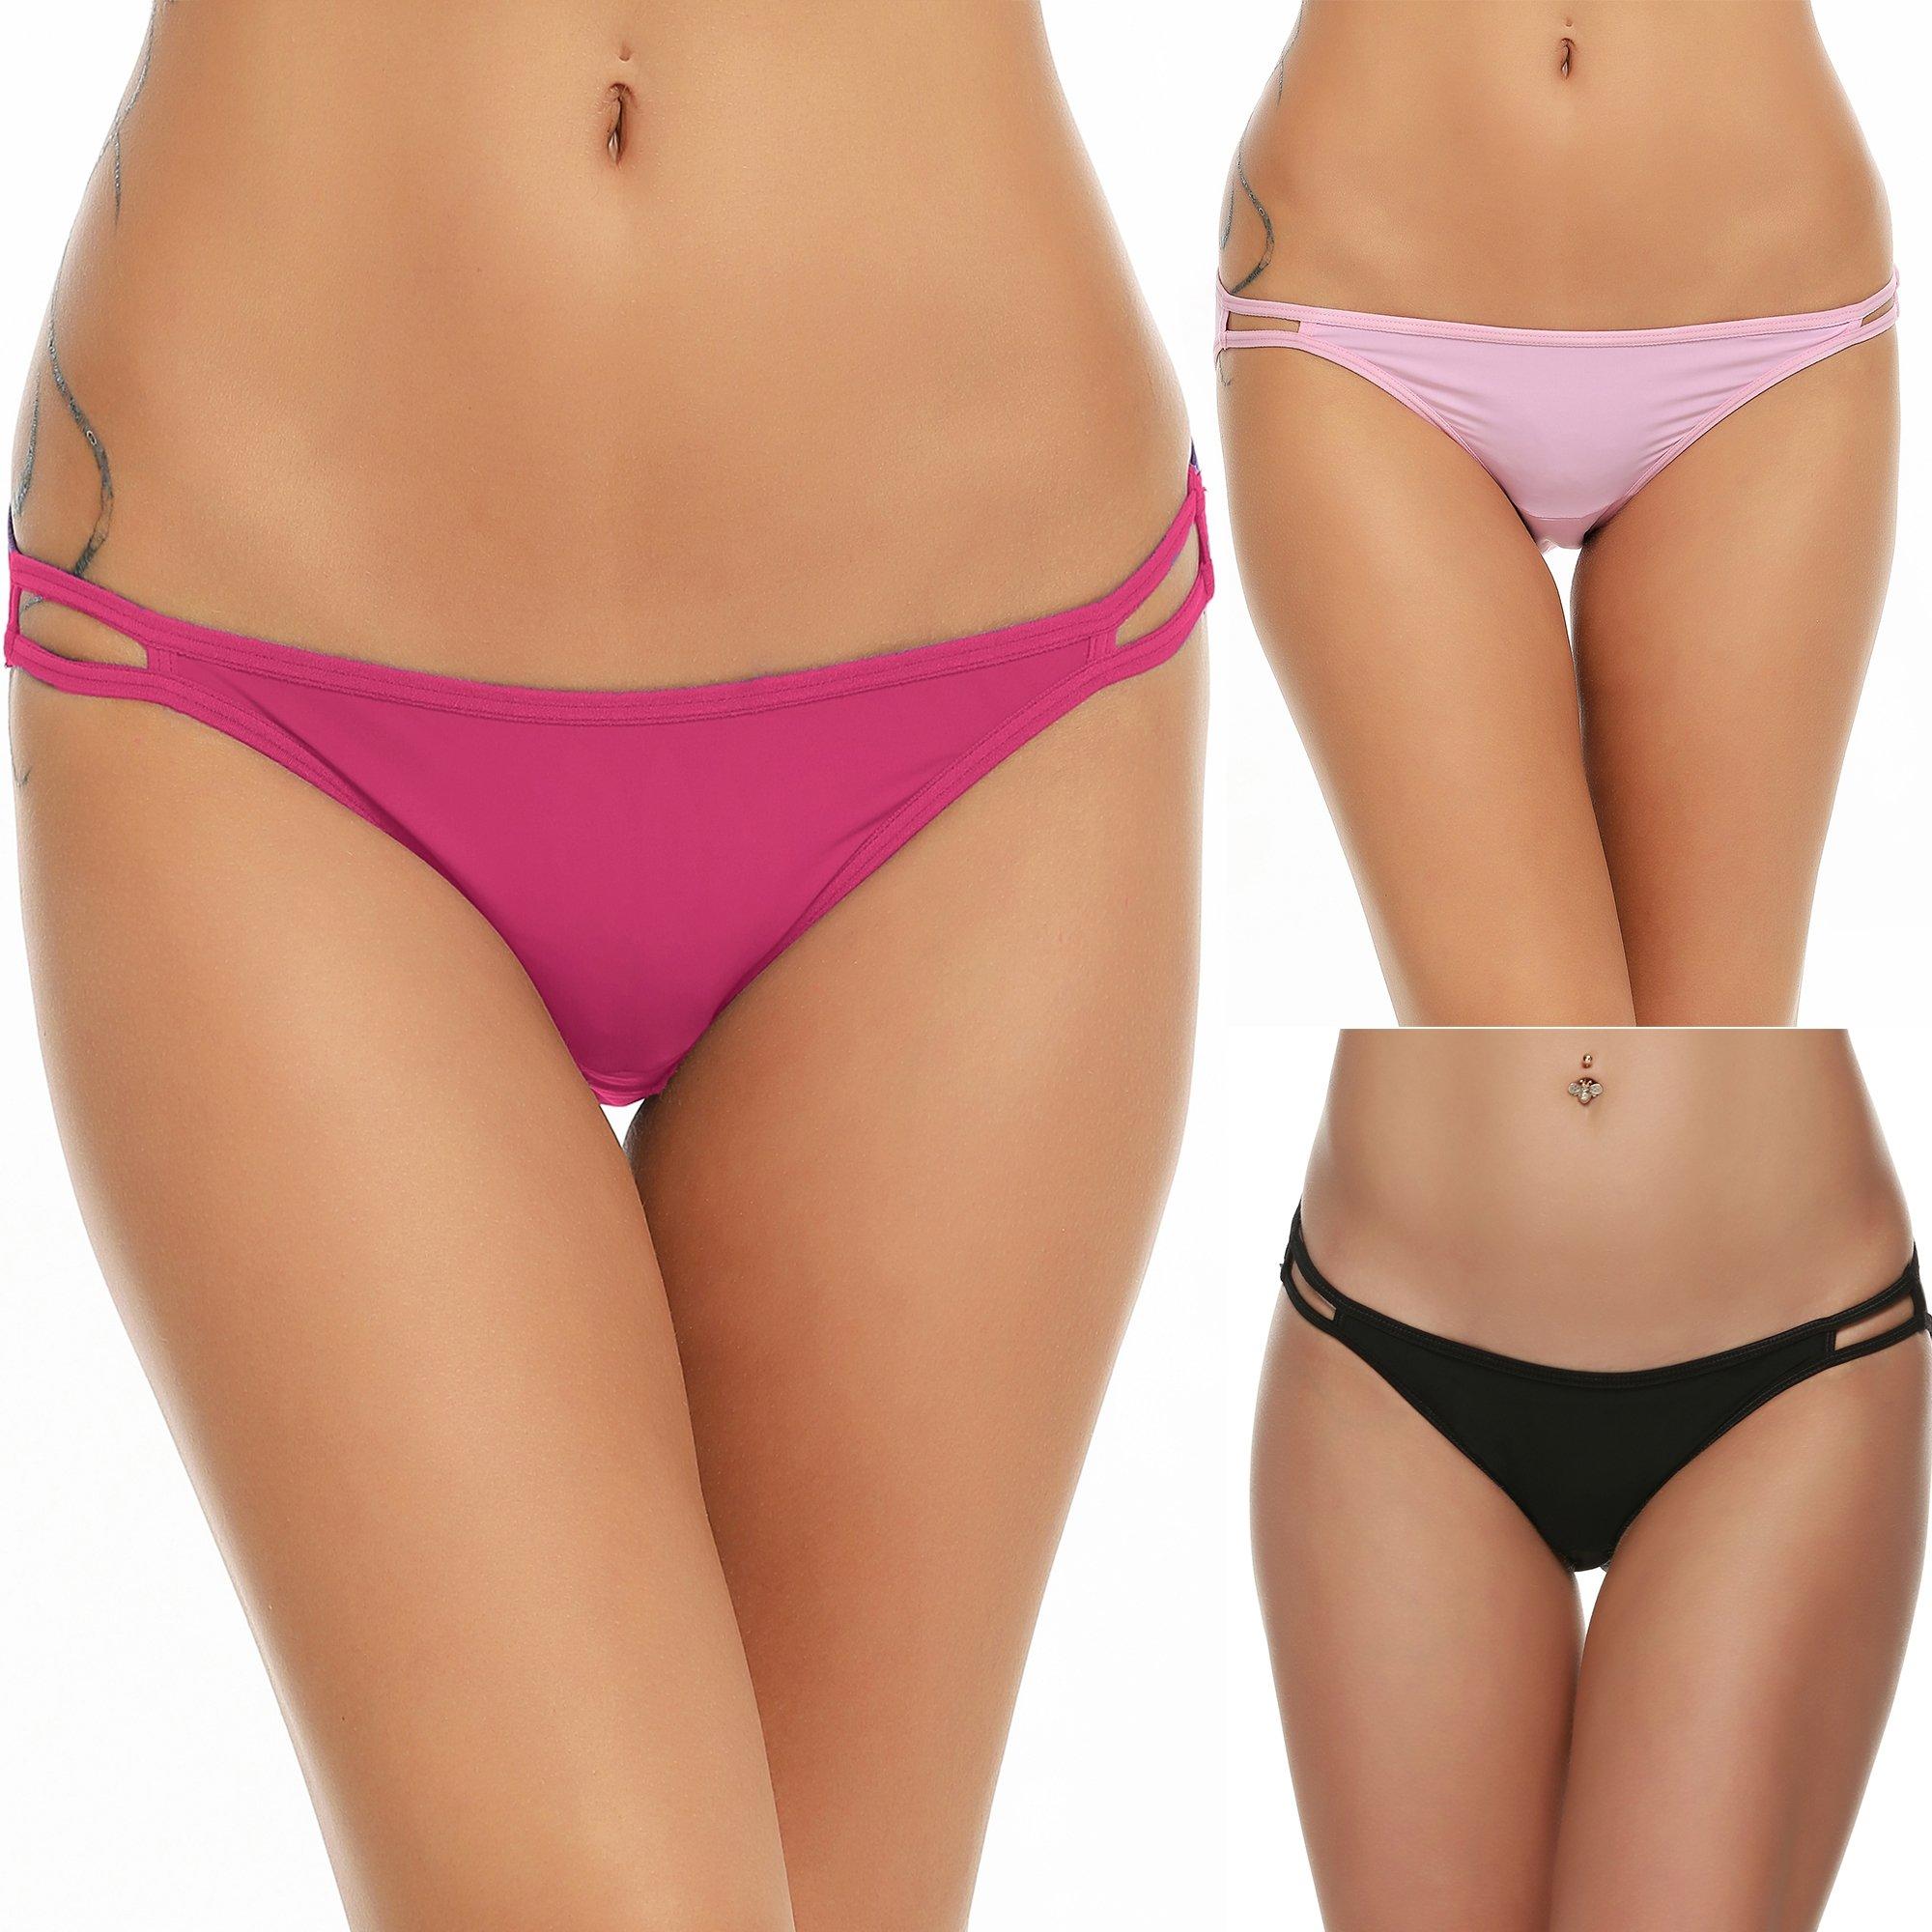 dbe6e00b7eb6 Galleon - Ekouaer Sexy Bikini Panties Womens 3 Pack Invisible Briefs  Underwear Red Assorted, XL